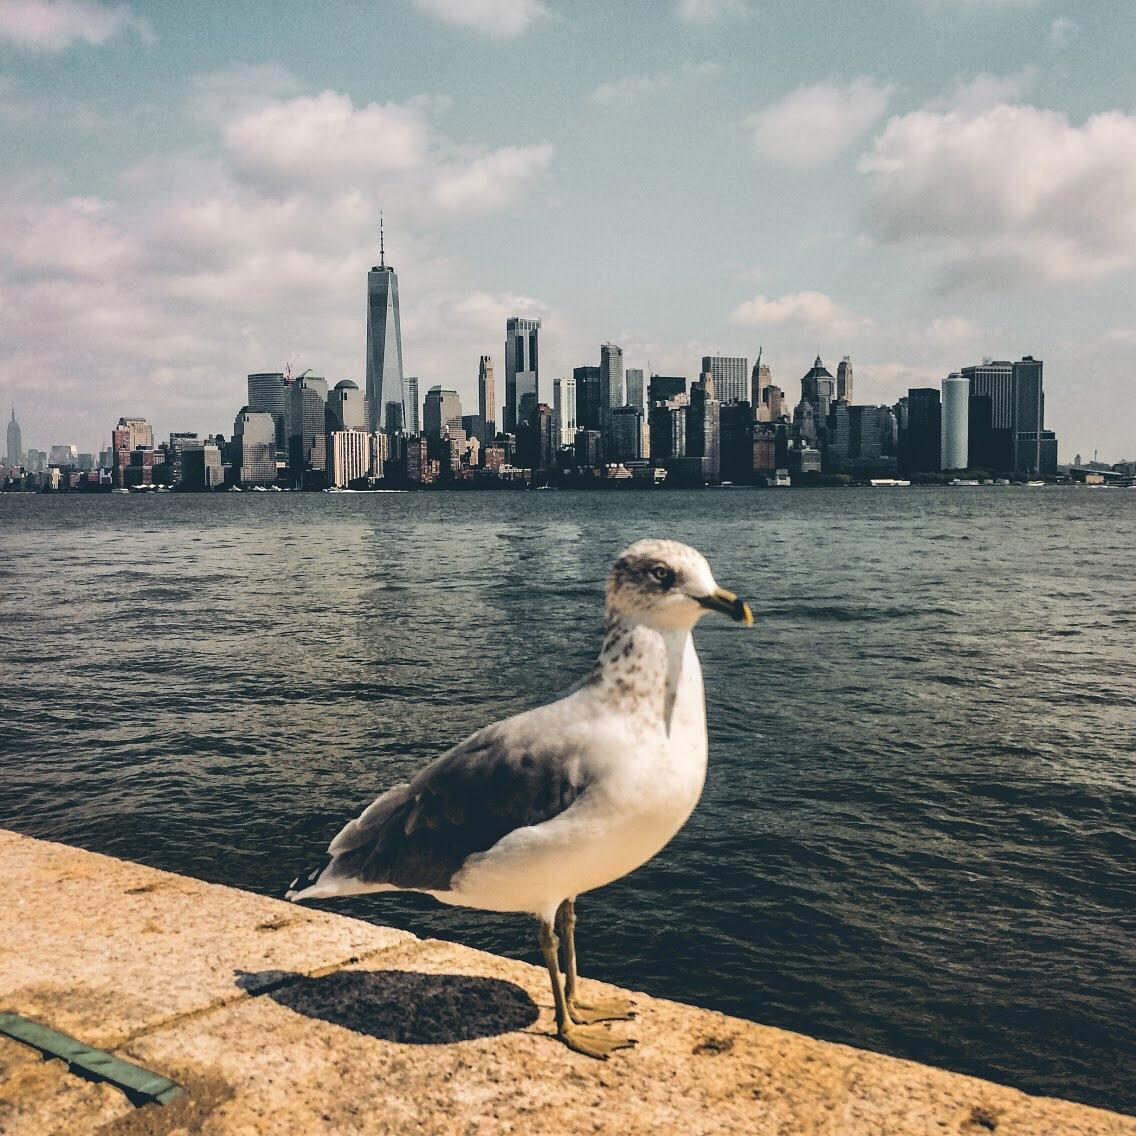 New York by Veronika Veseleniova